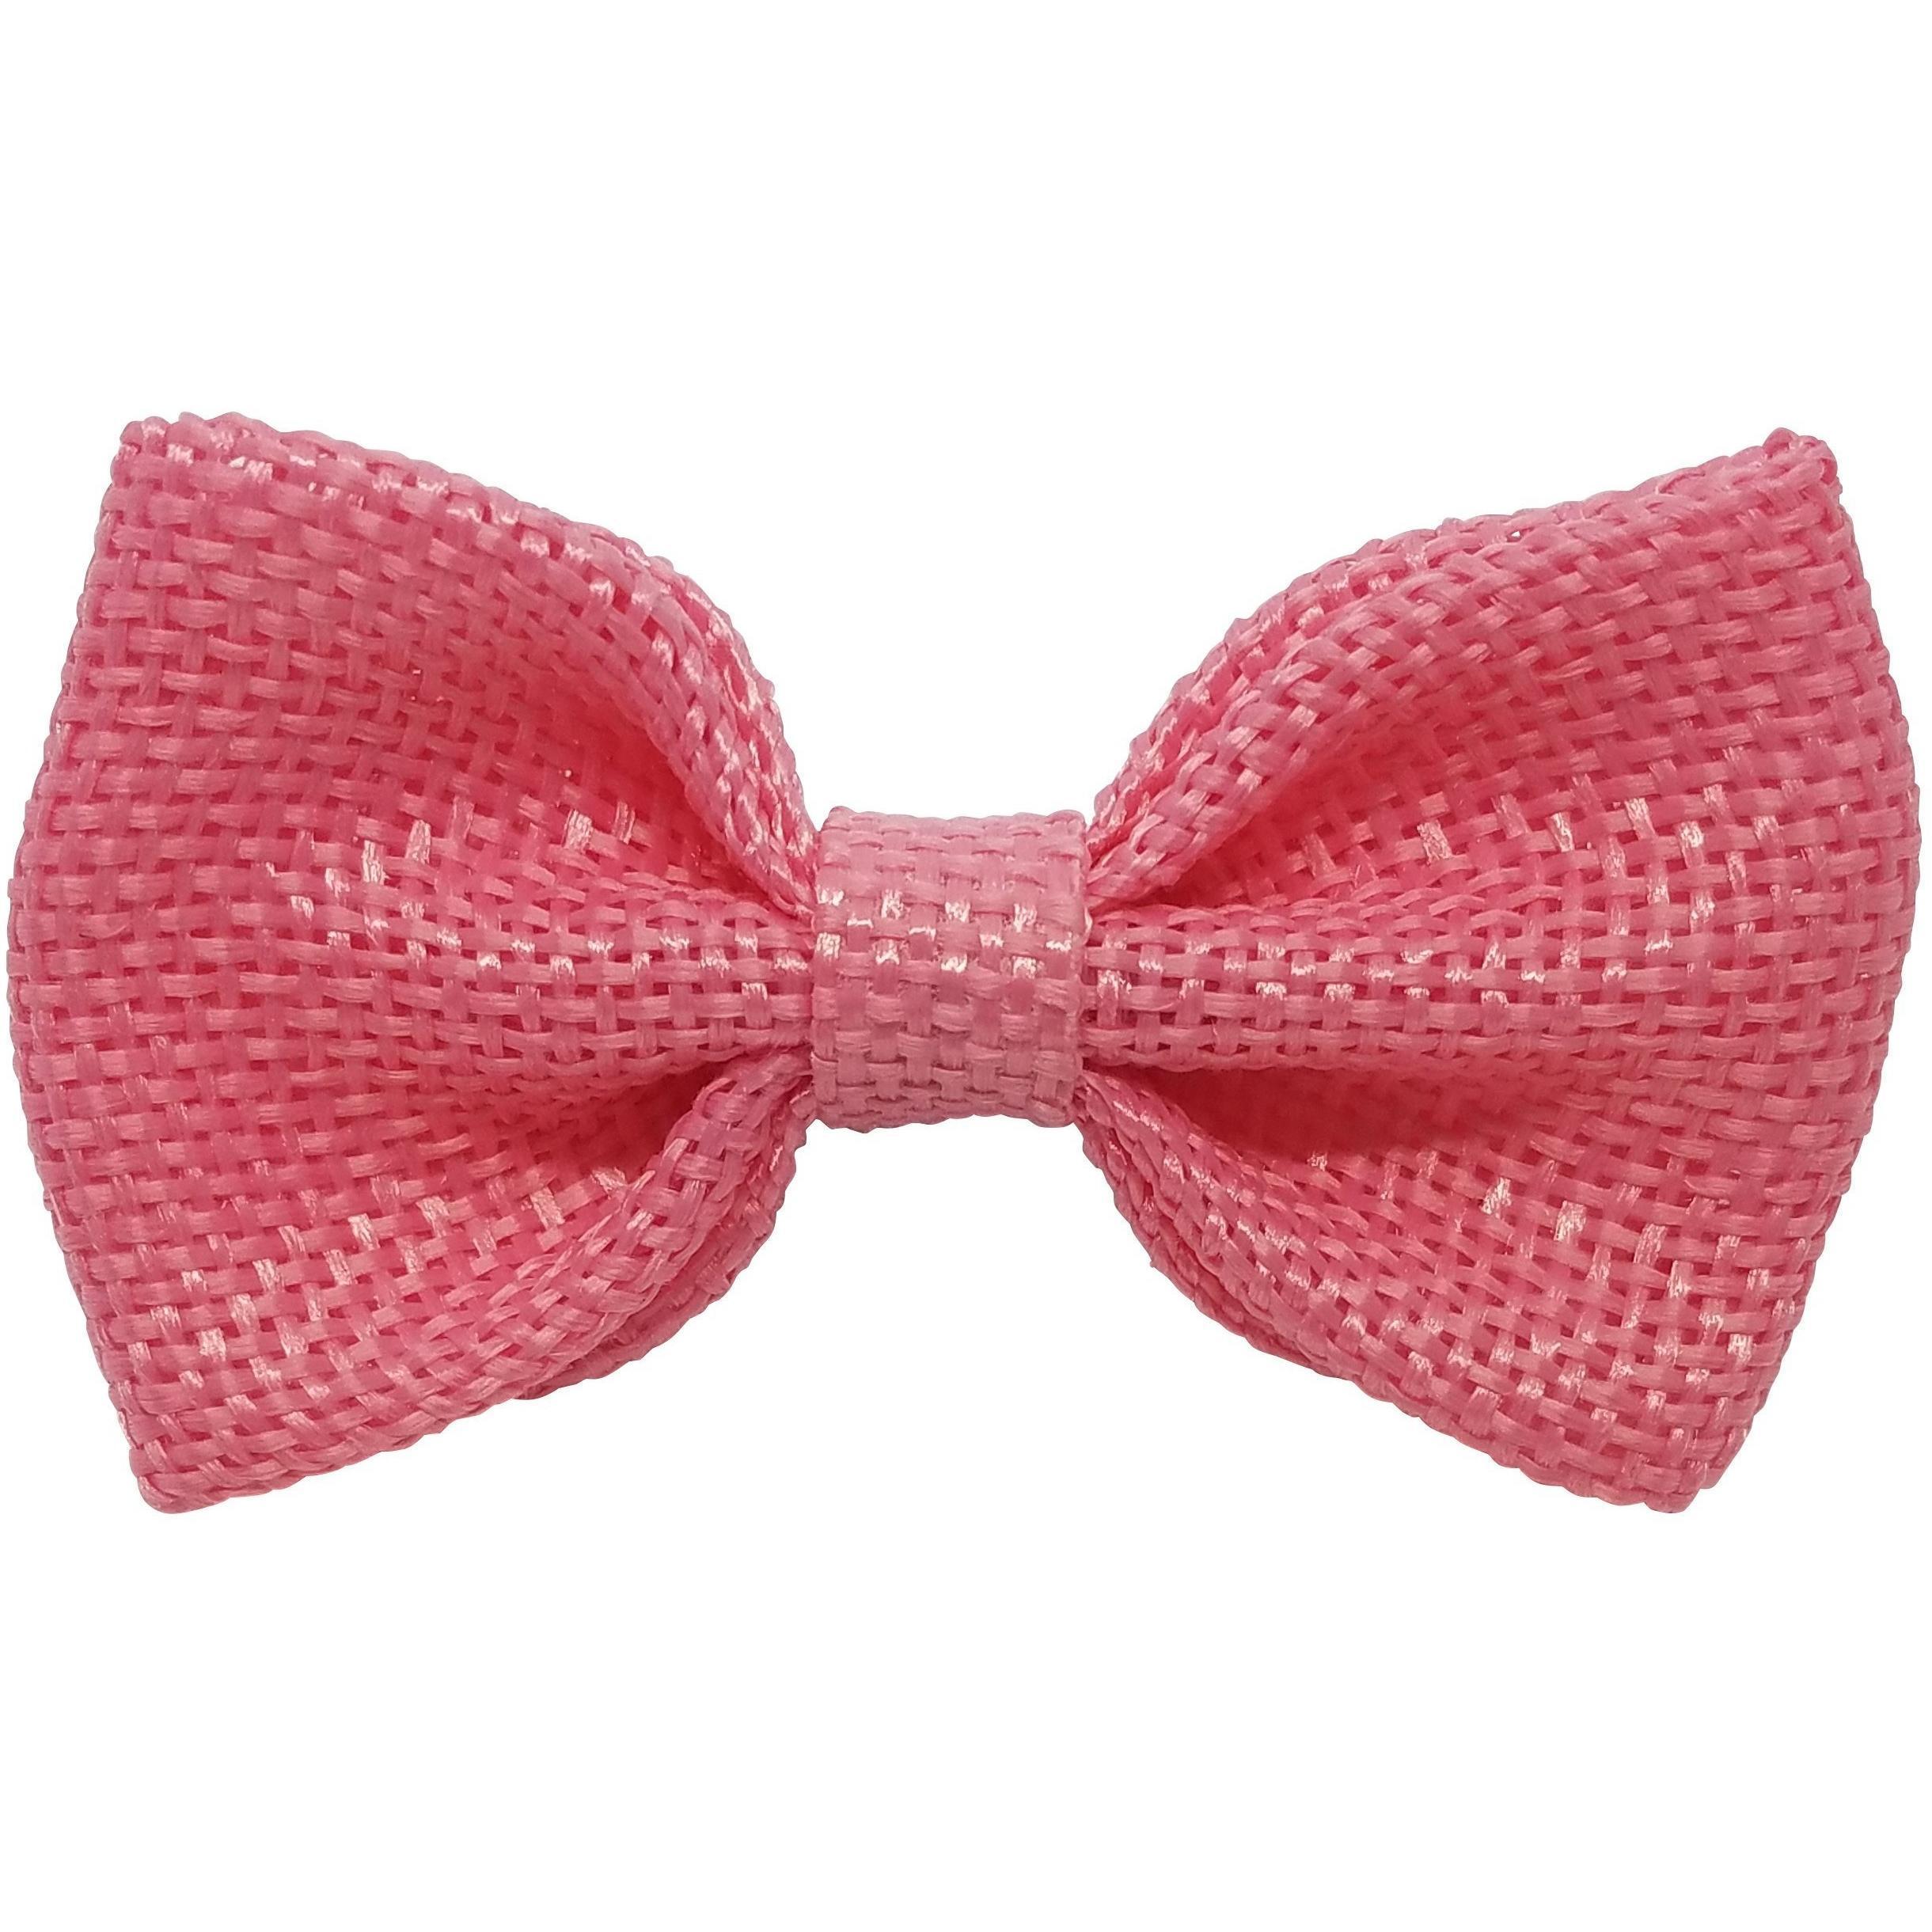 488172d2520b4 Ivory 3 | Products | Burlap hair bows, Blue, Bow hair clips